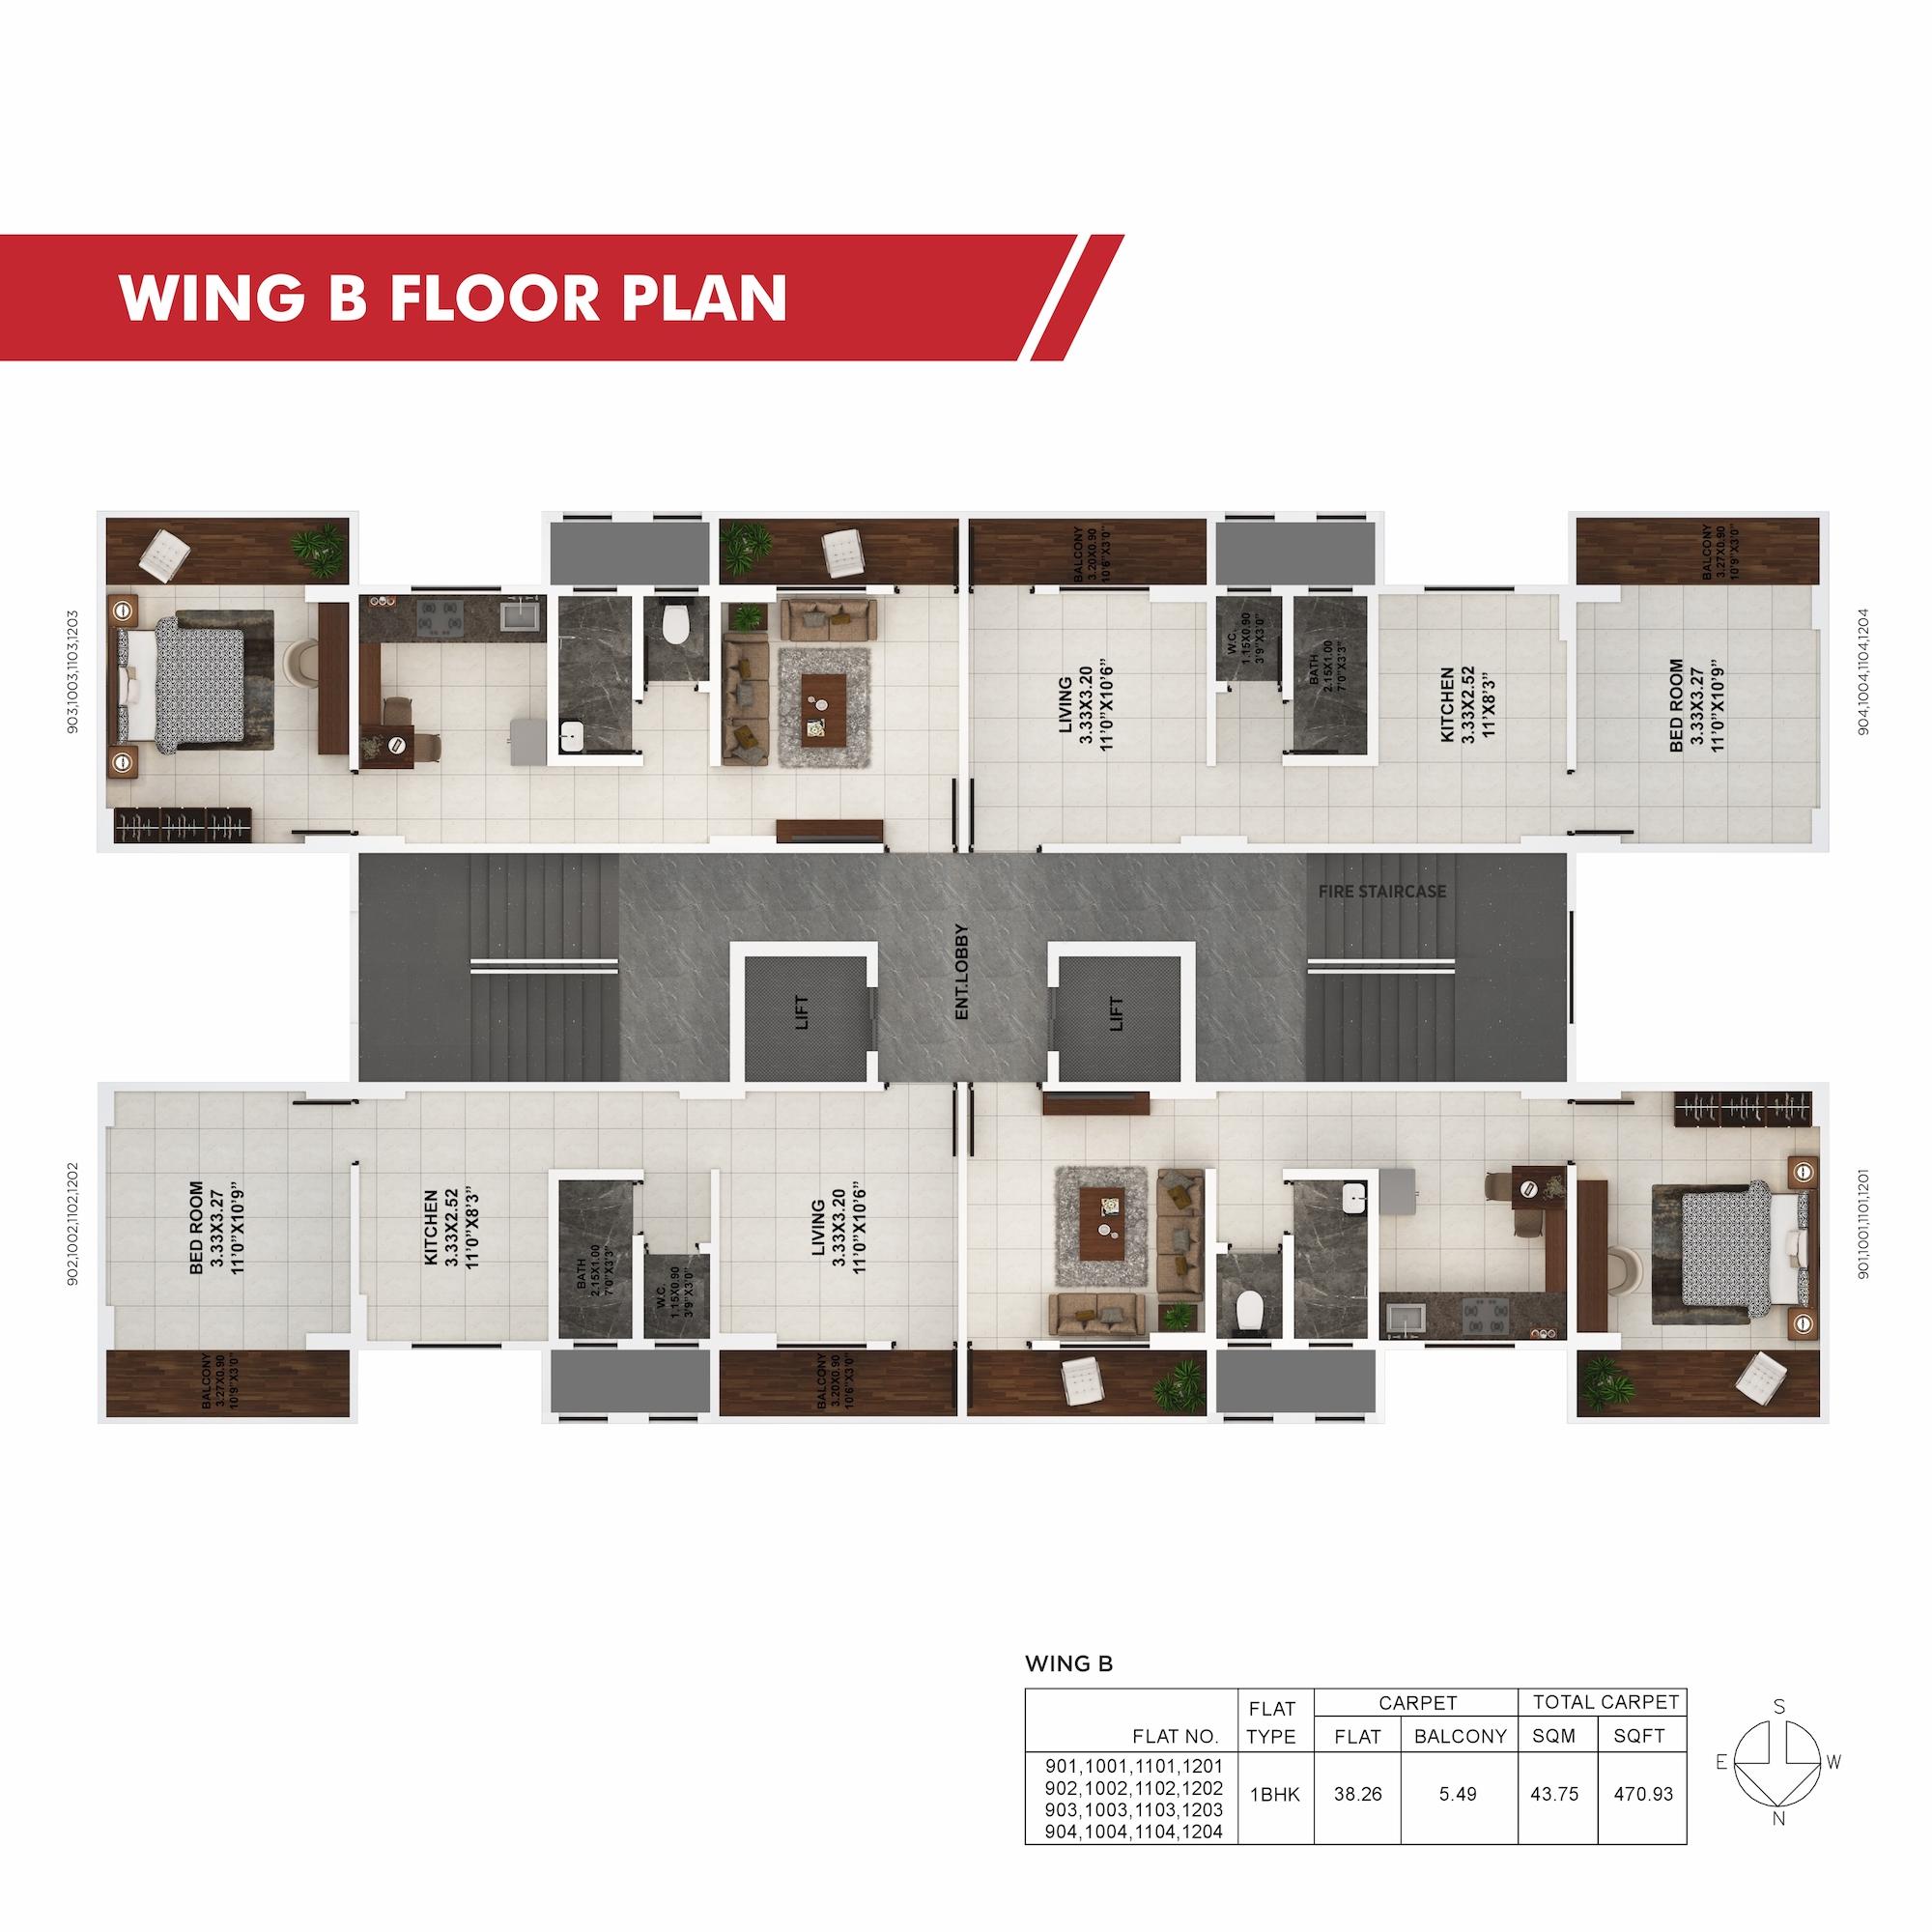 Palaash Wing B Floor Plan